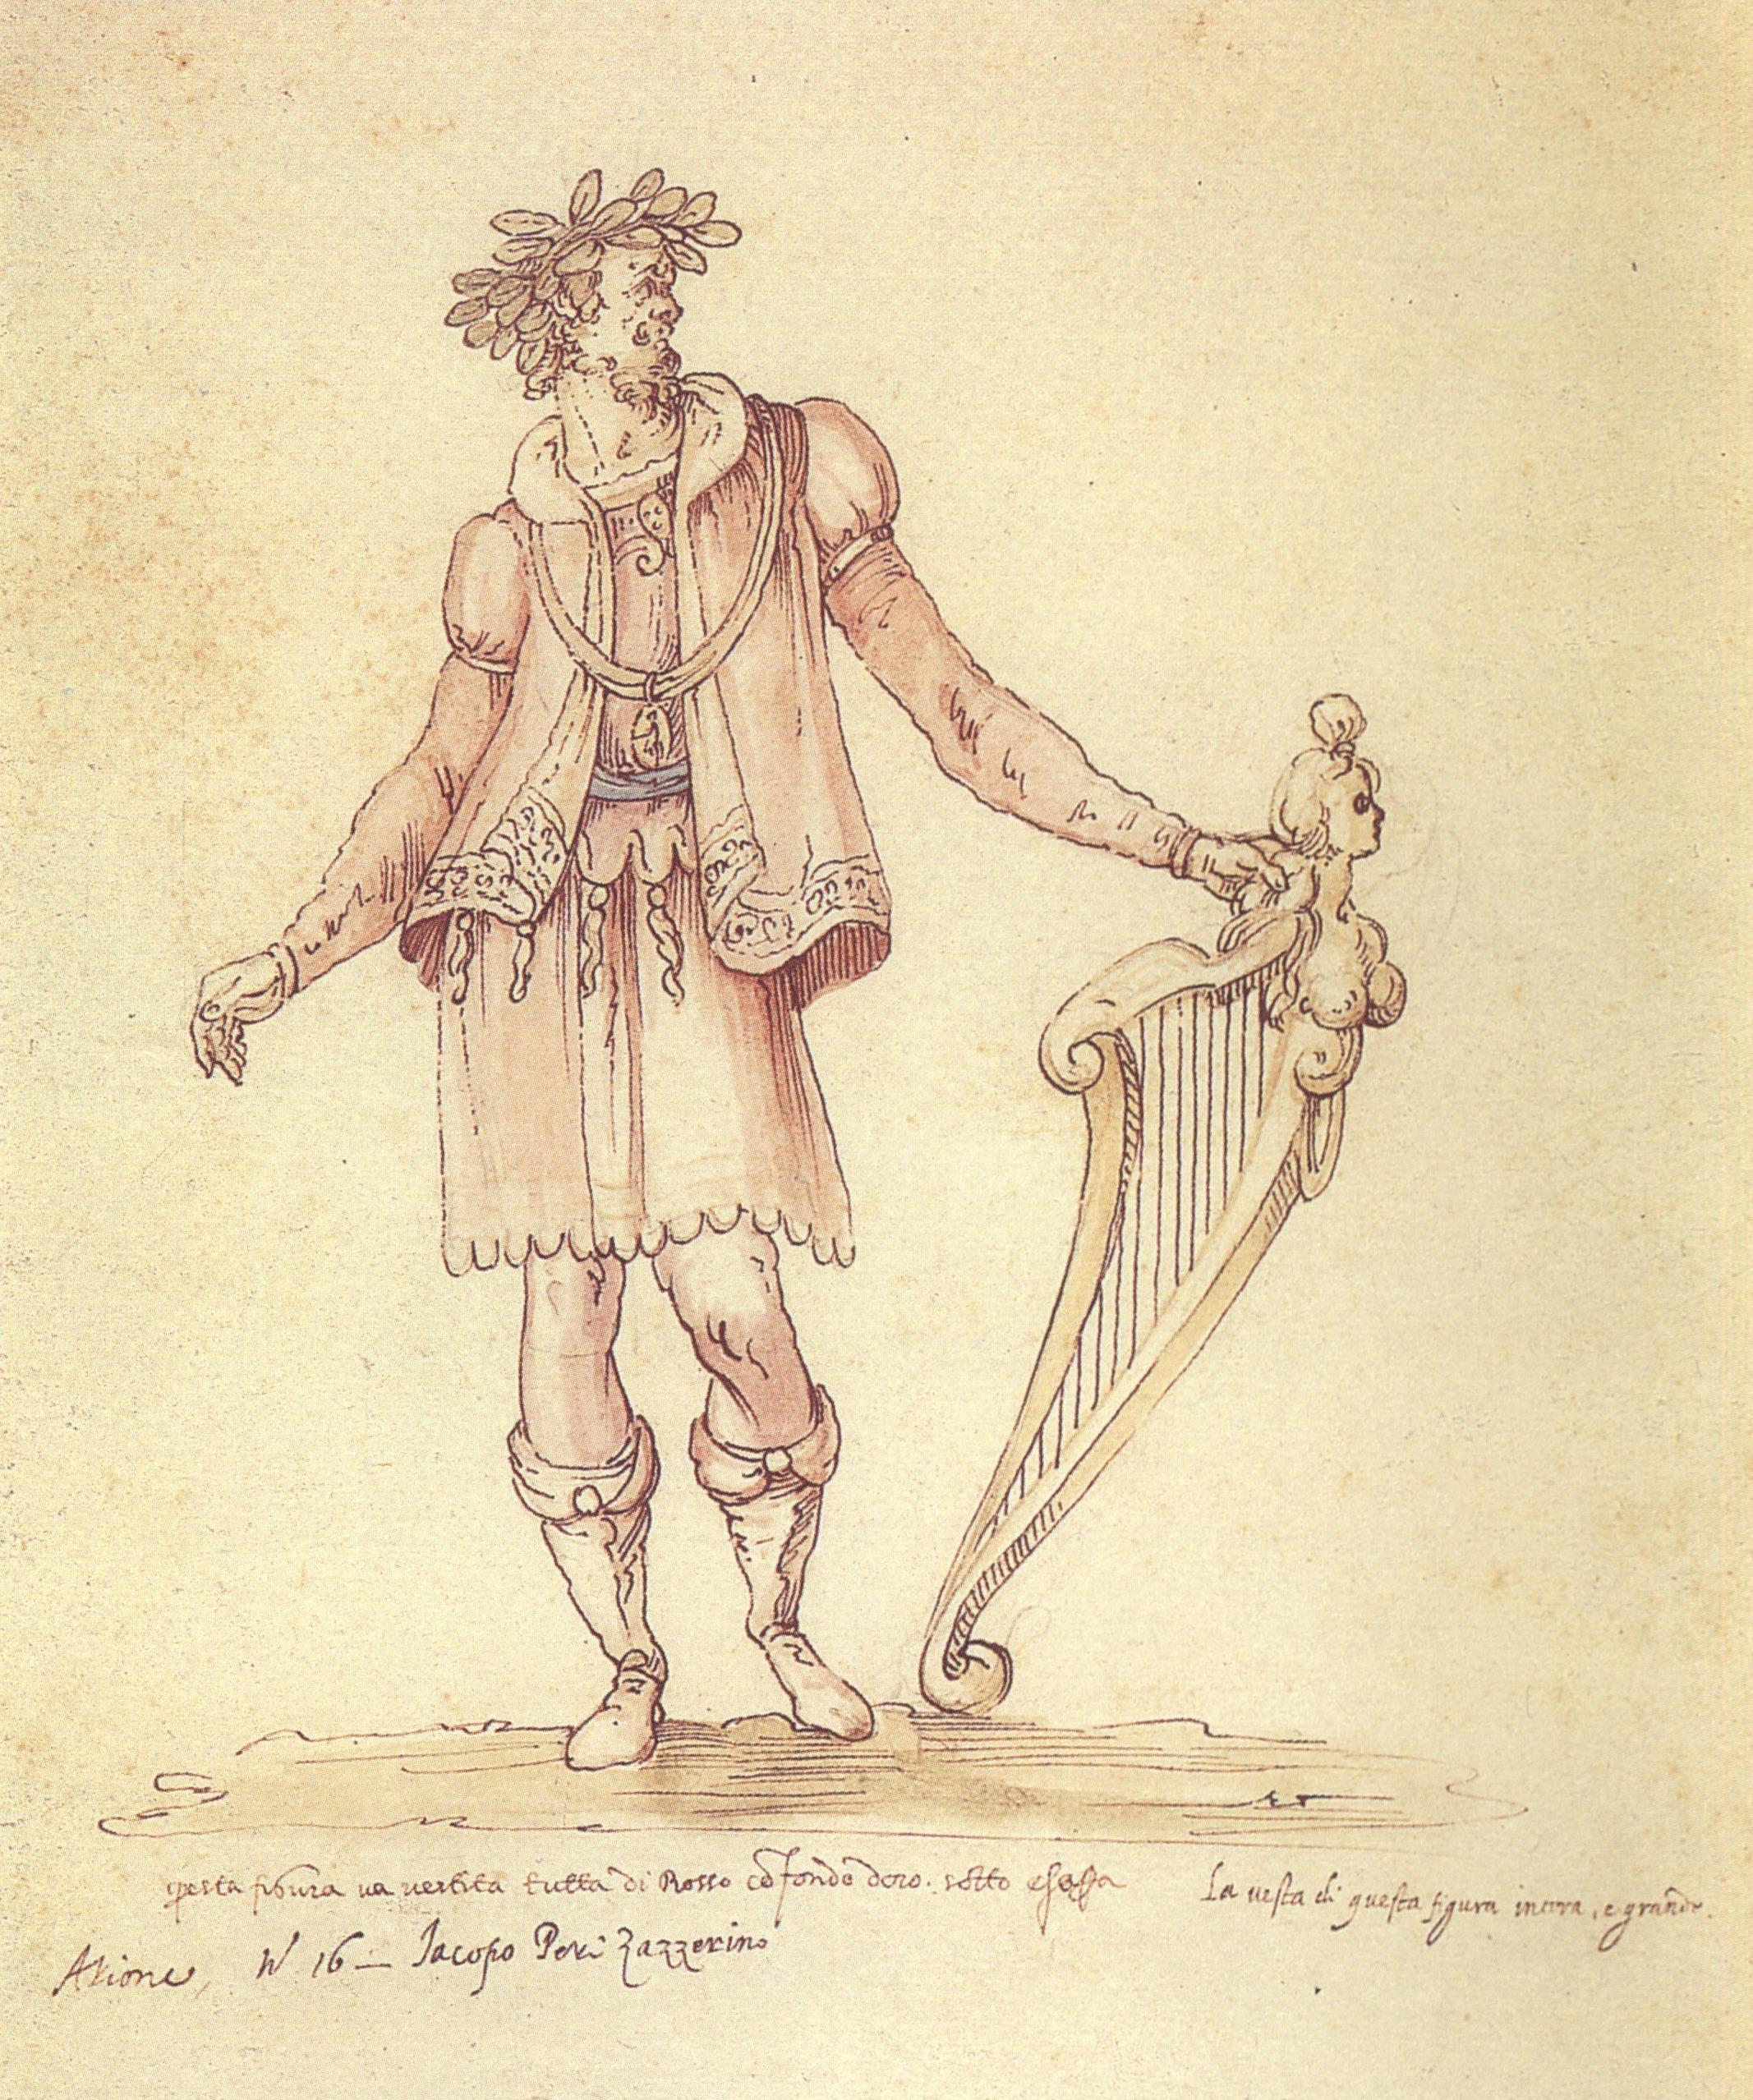 Ficheiro:Jacopo Peri 1.jpg